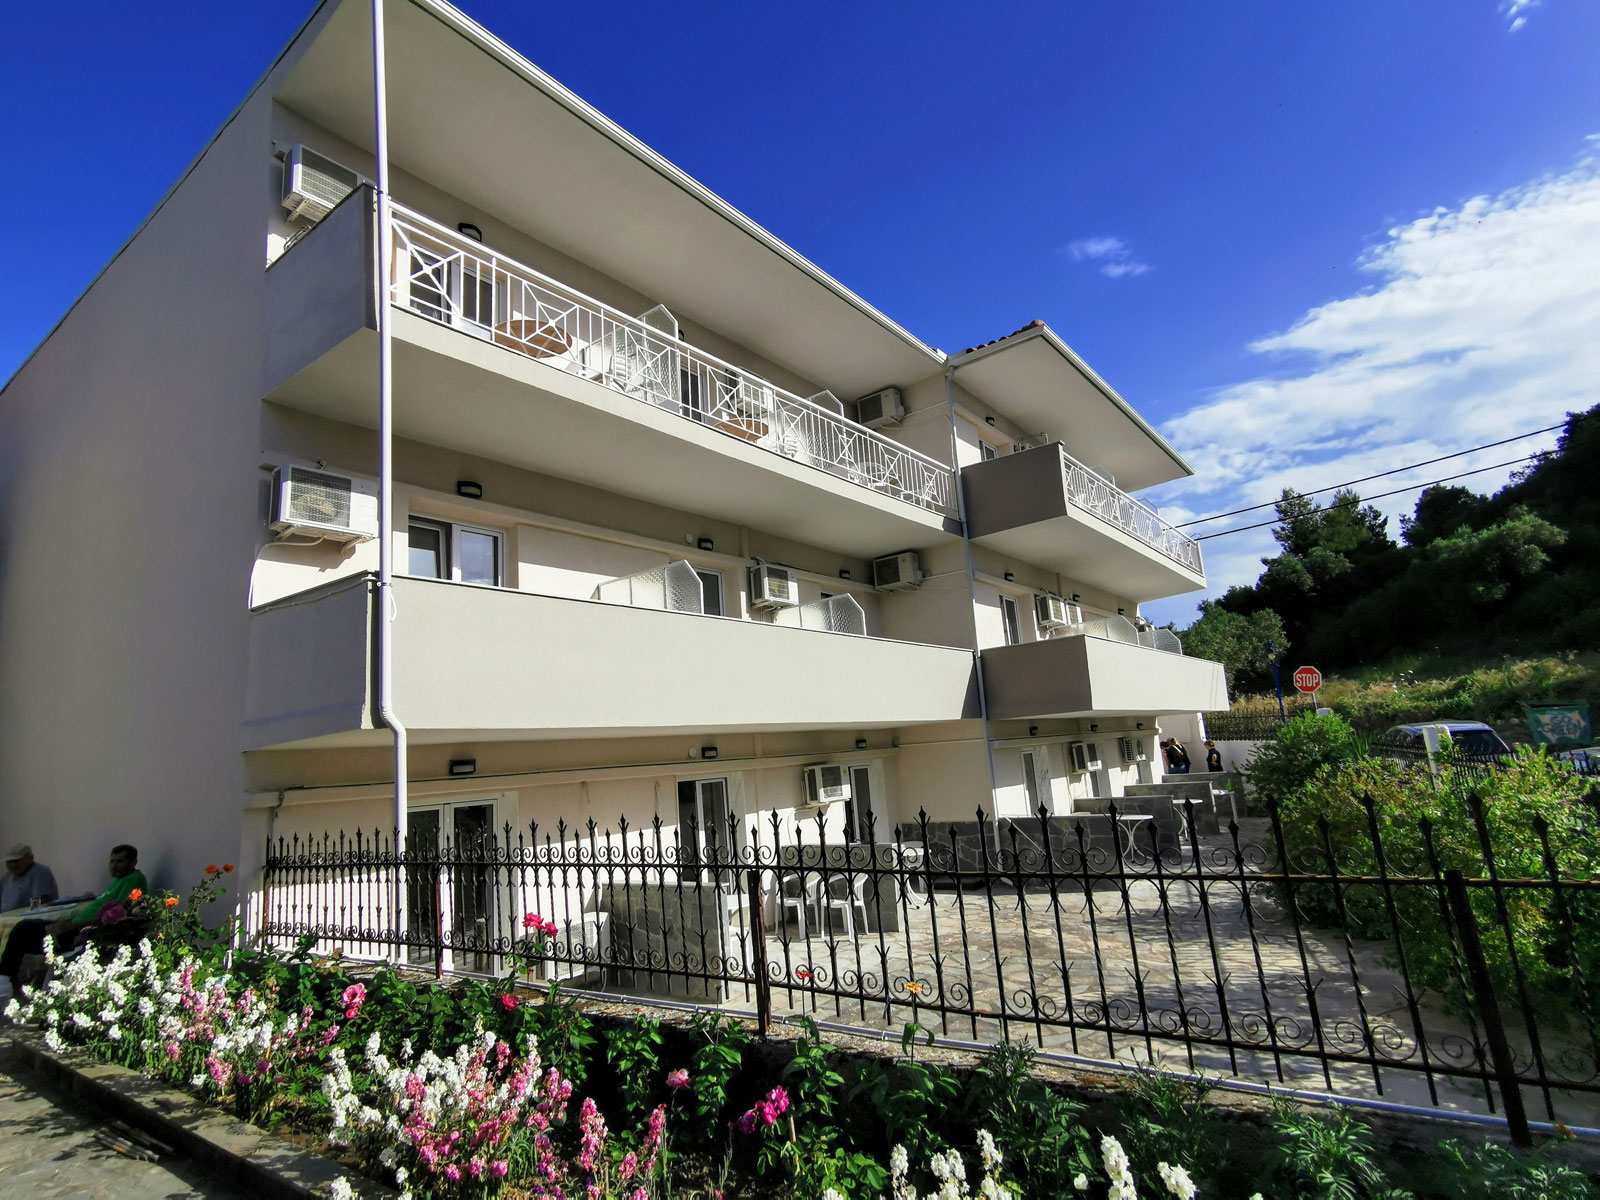 Grcka apartmani letovanje, Polihrono Halkidiki, Green Gardens, eksterijer, kuća A, dvorište prema ulici